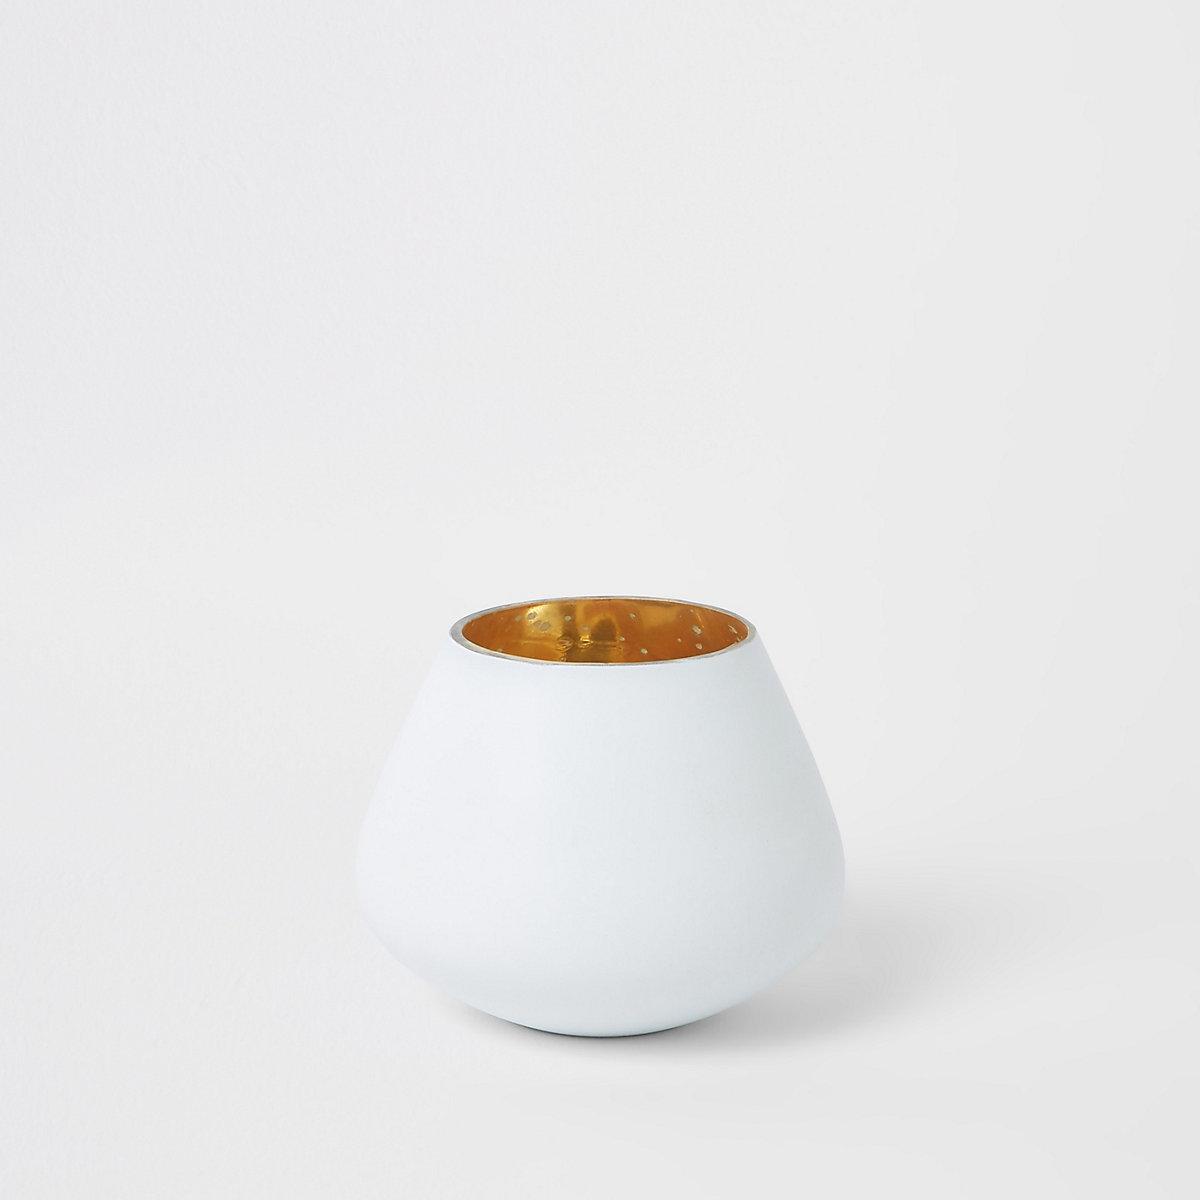 Petit bougeoir chauffe-plat blanc mat